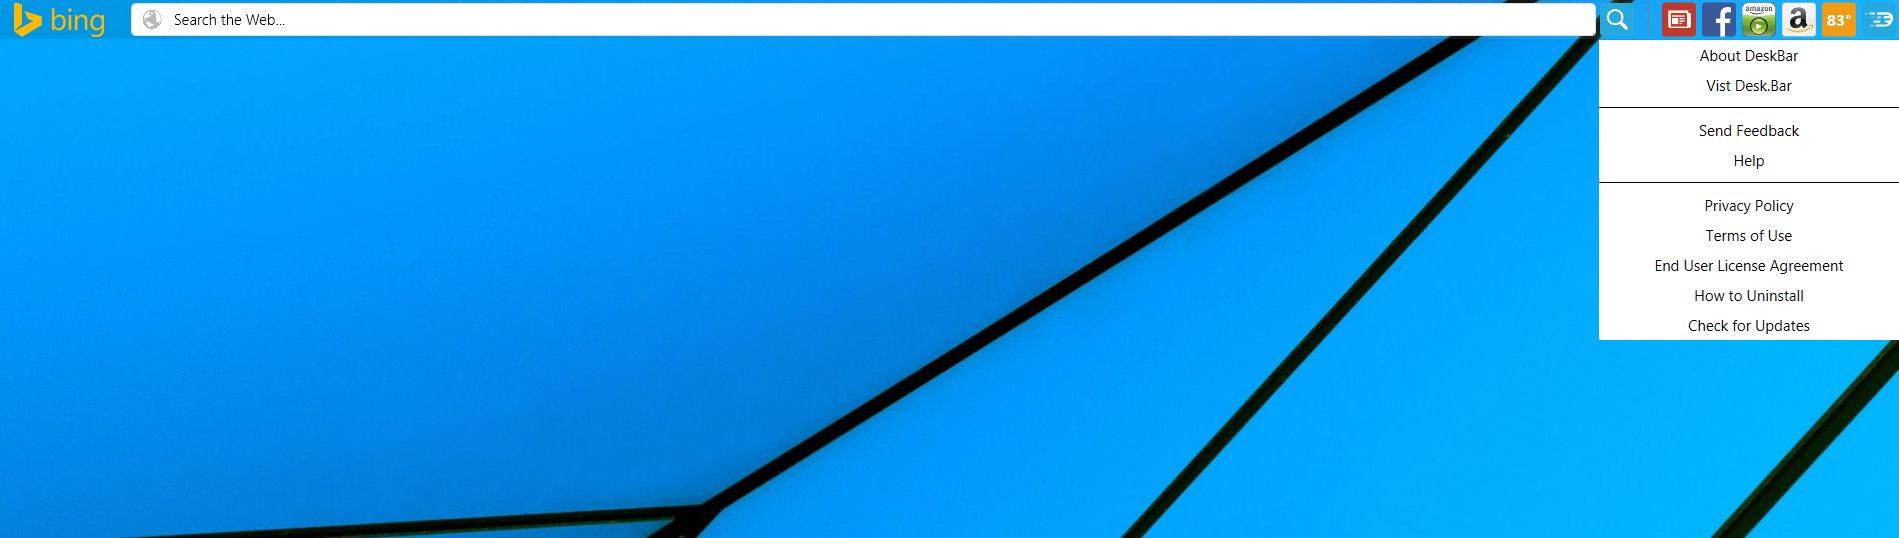 Remove DeskBar toolbar by Blue Labs (Uninstall Guide)